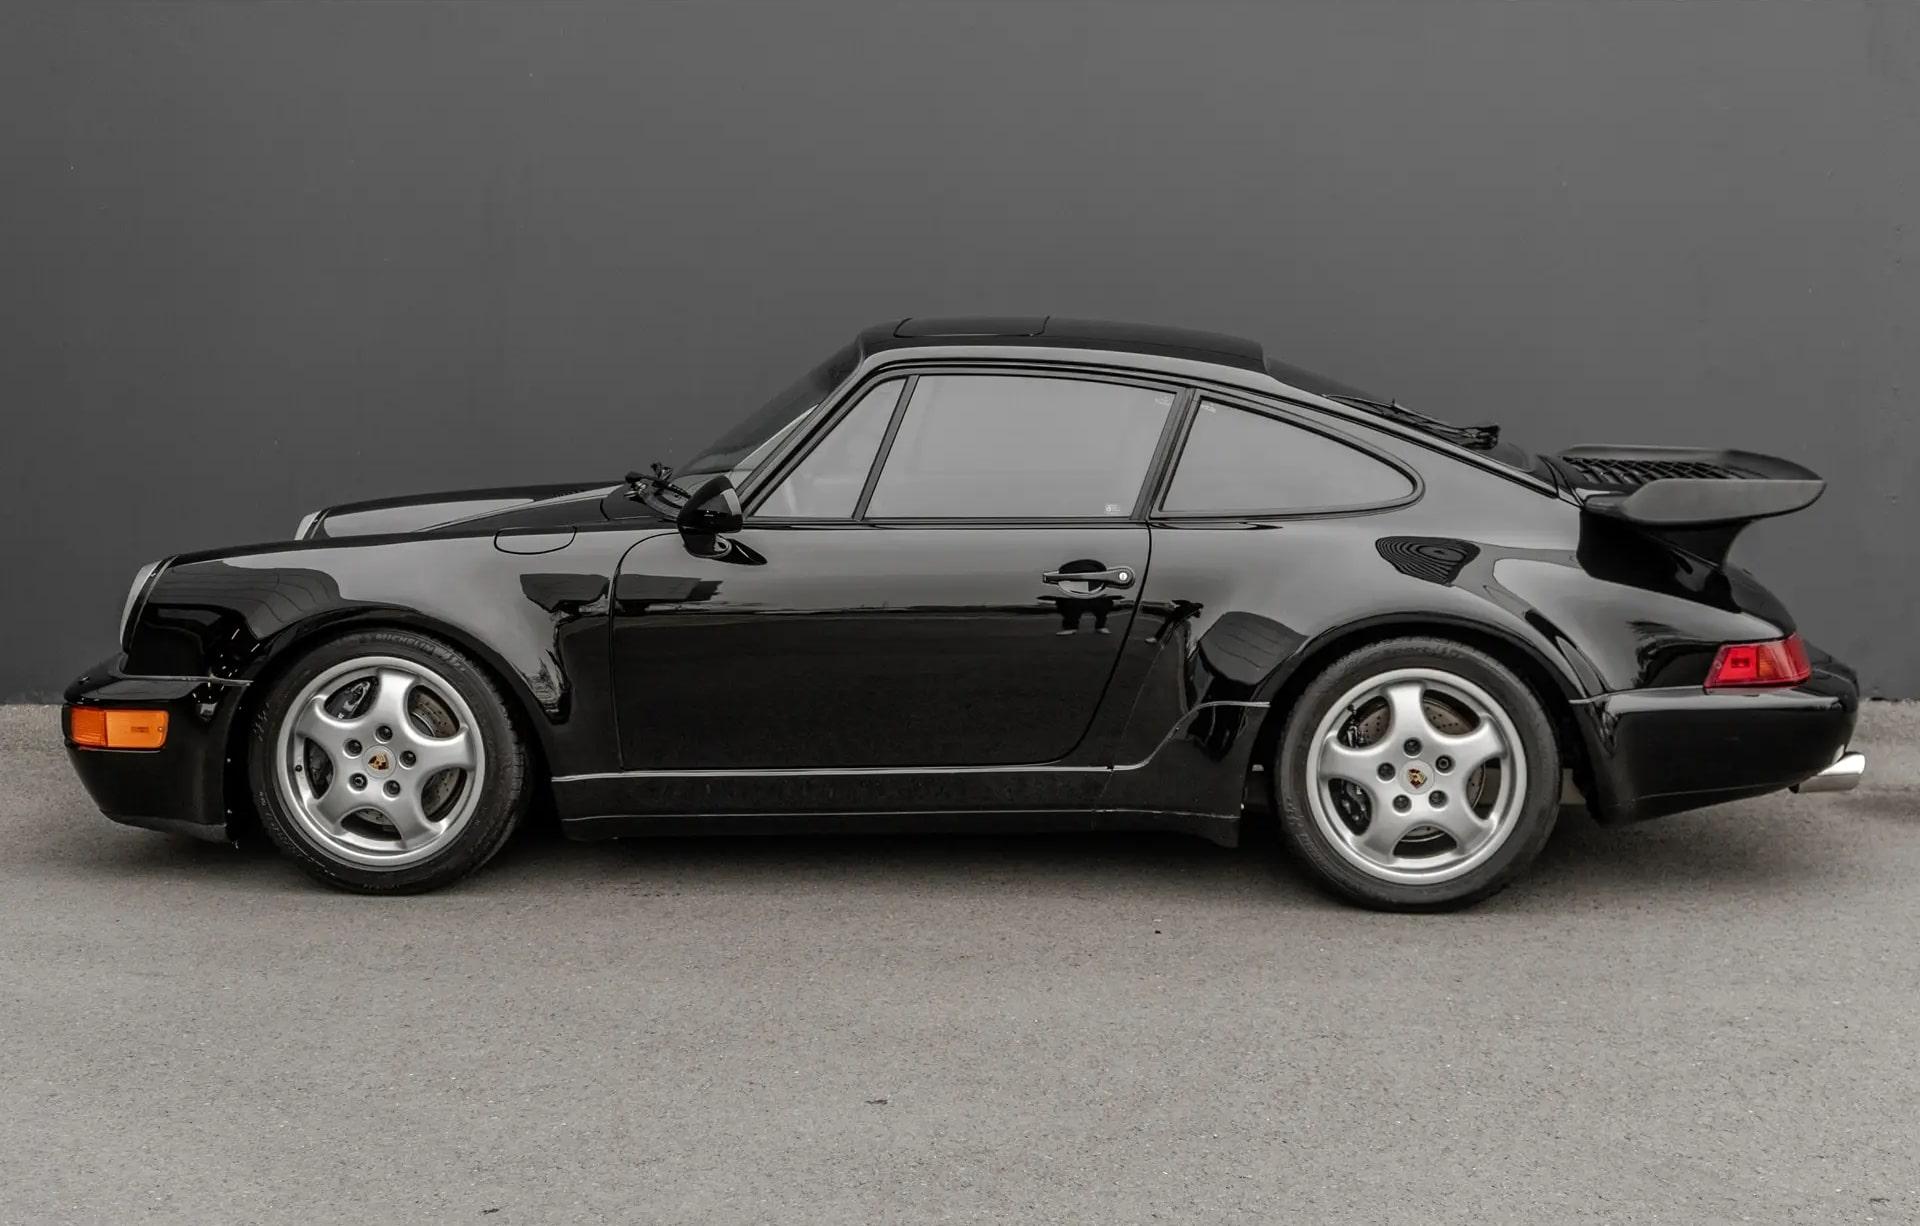 Porsche 964 Turbo